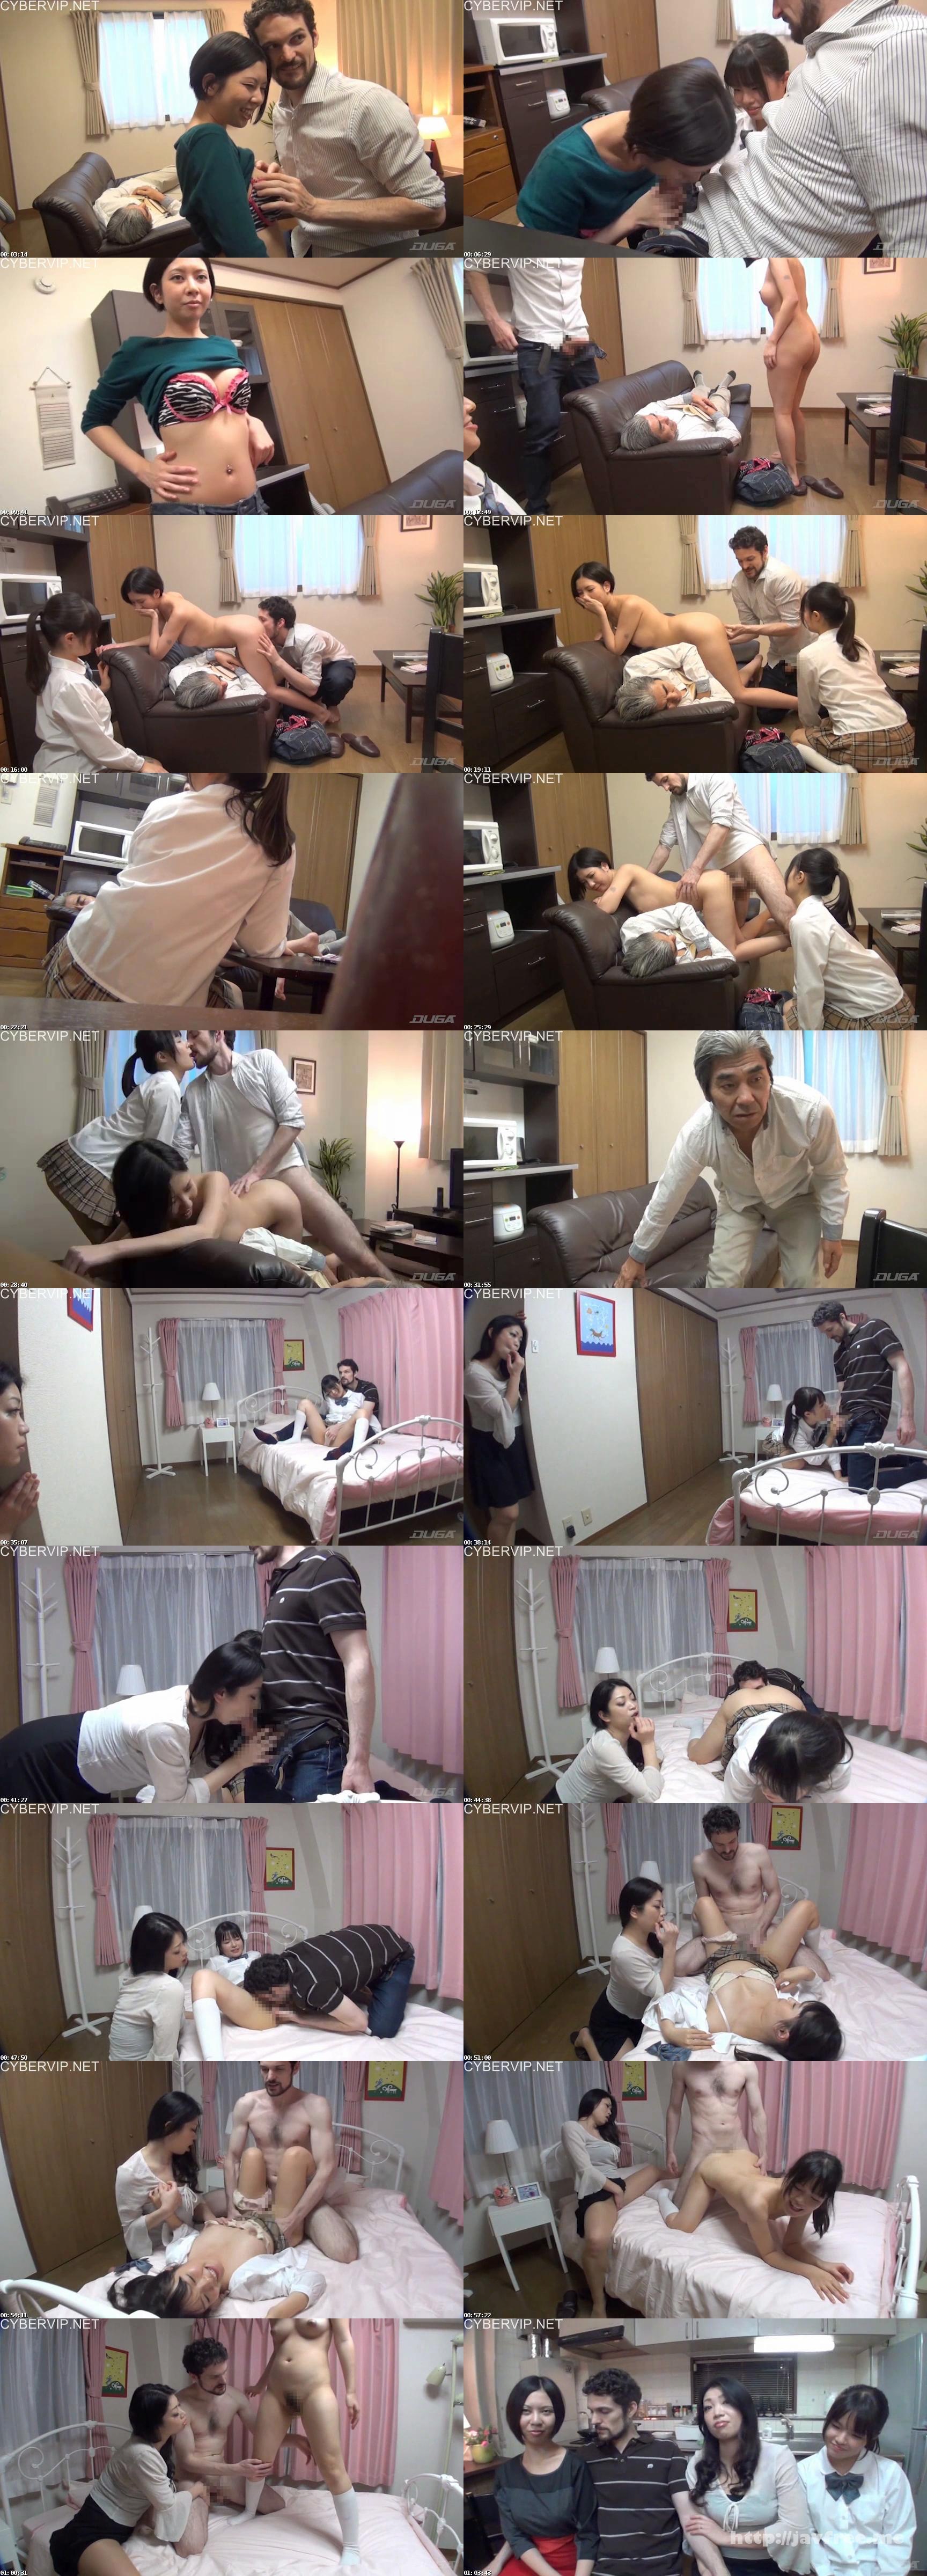 [GENB 002] イケメン不良外国人がホームステイ先で母娘を寝取り旦那の隙を見て膣中出し! GENB